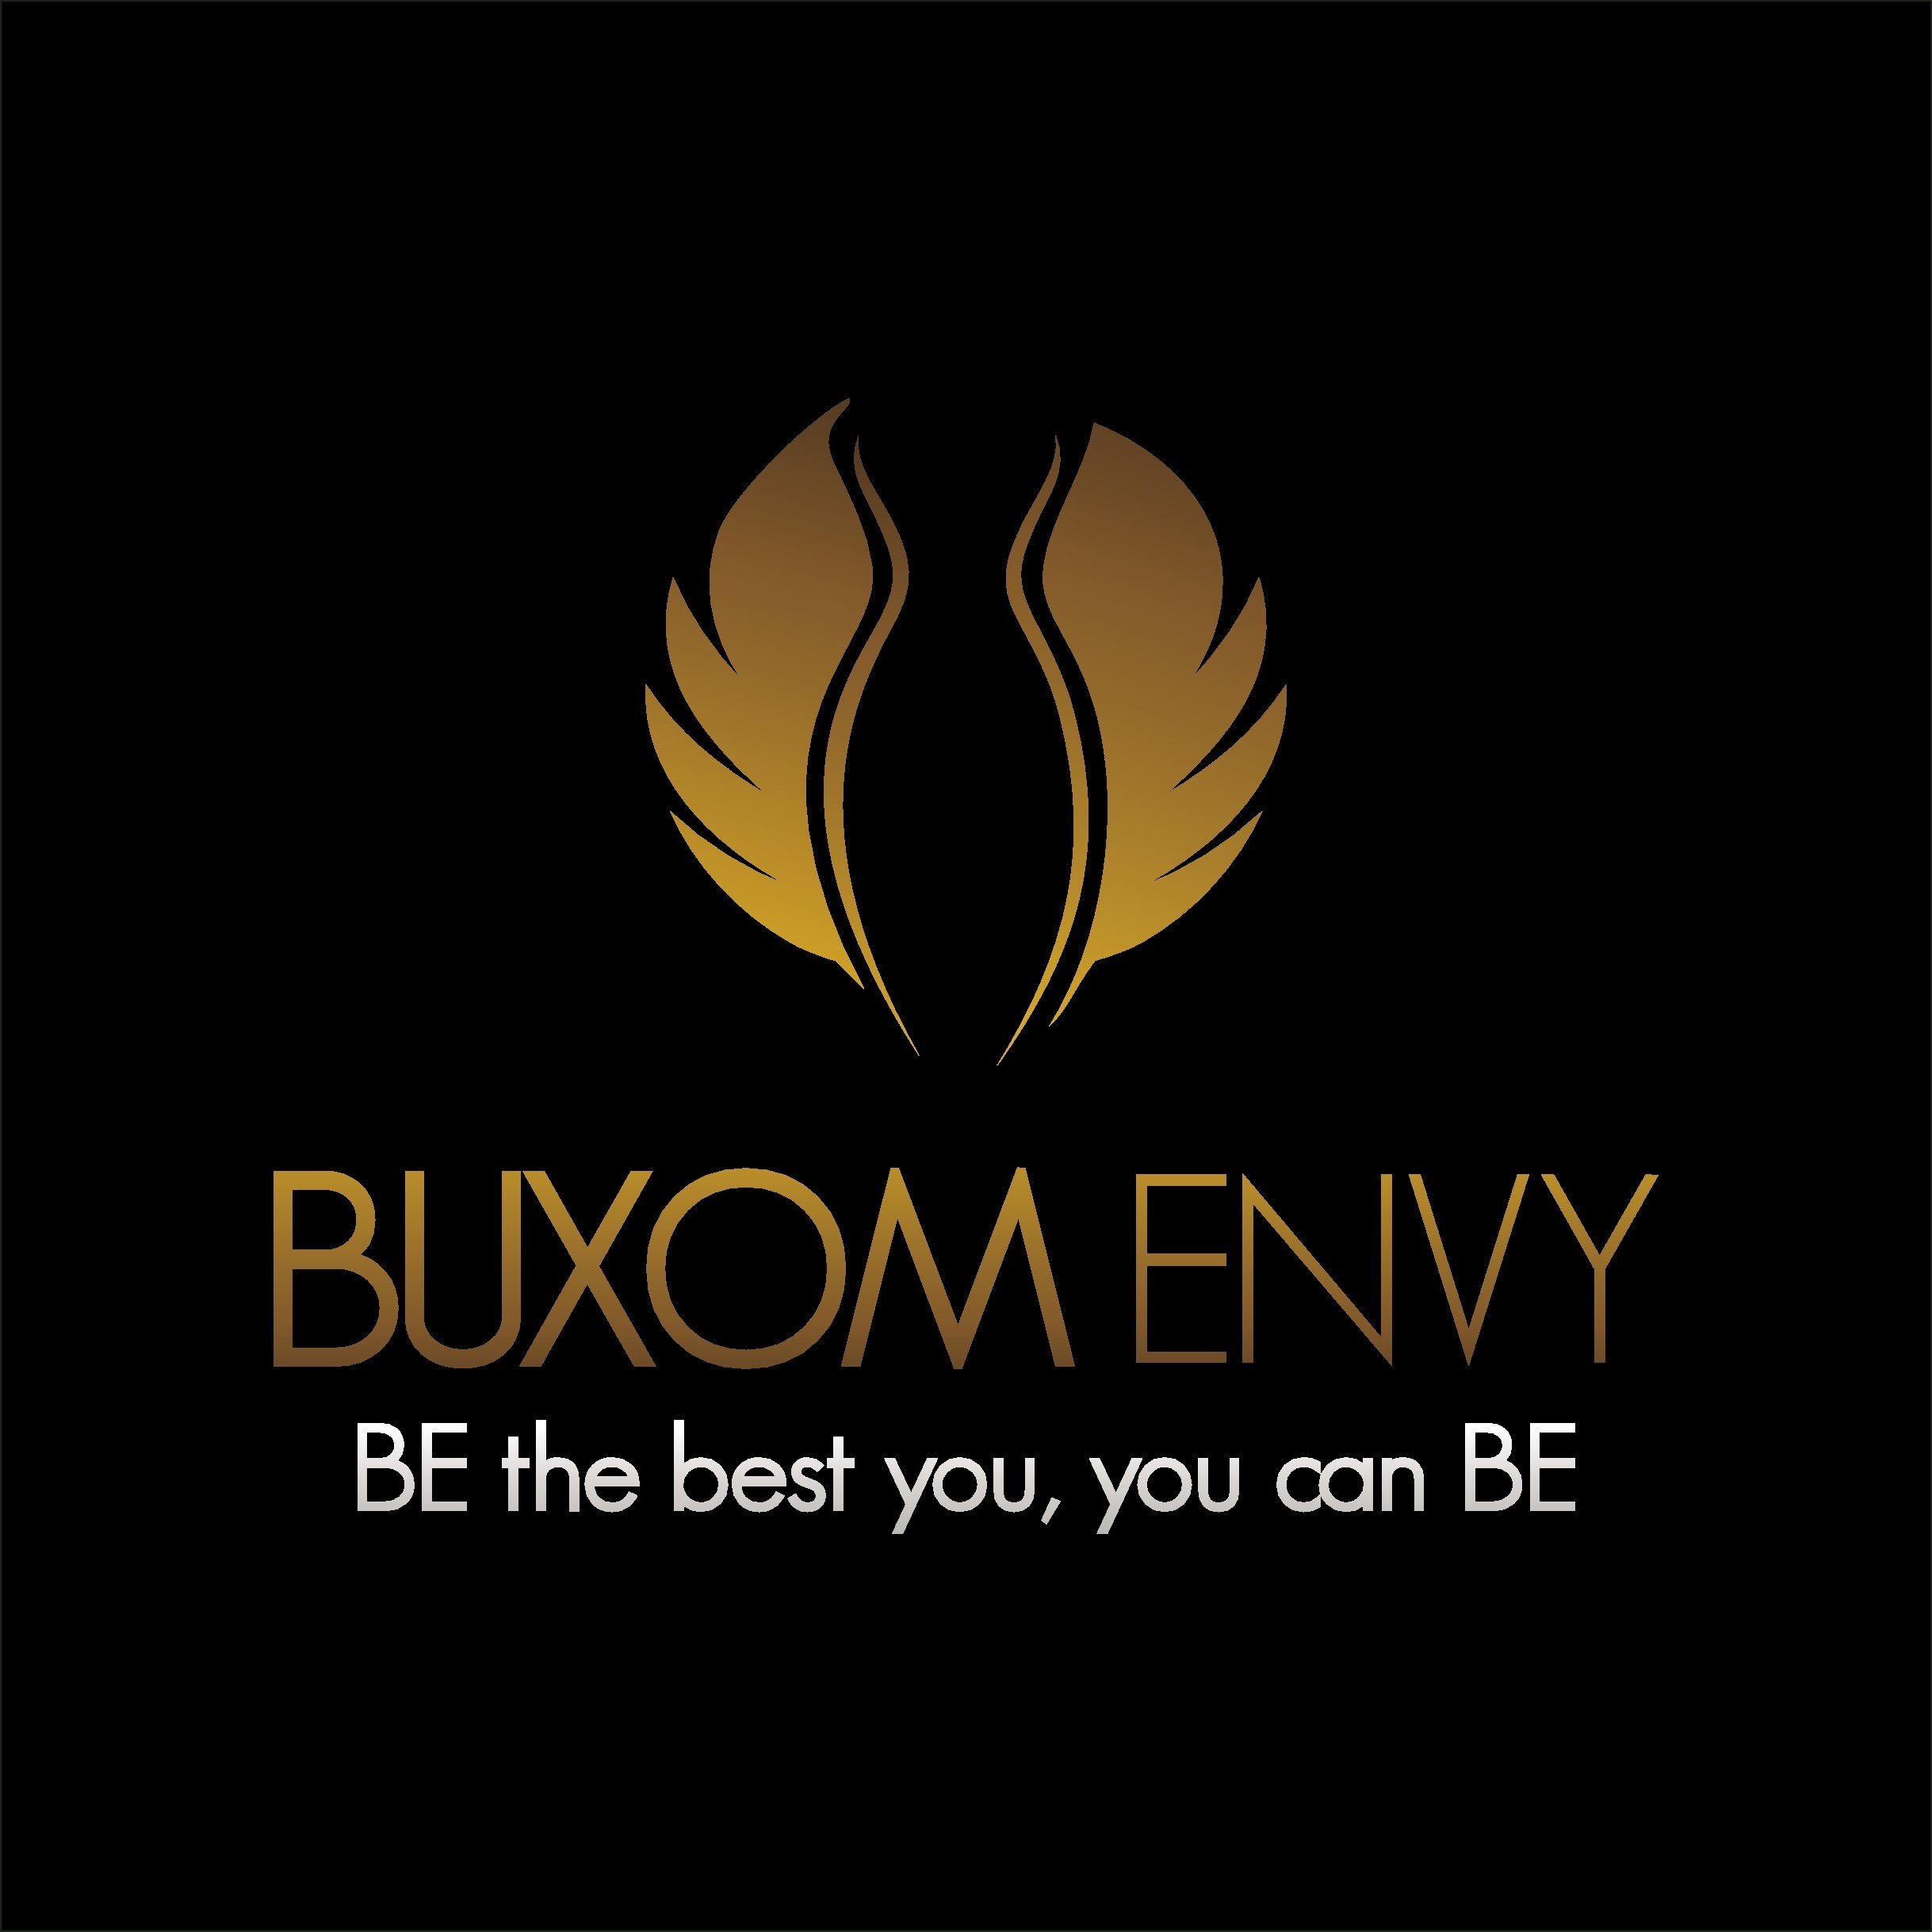 Buxom Envy